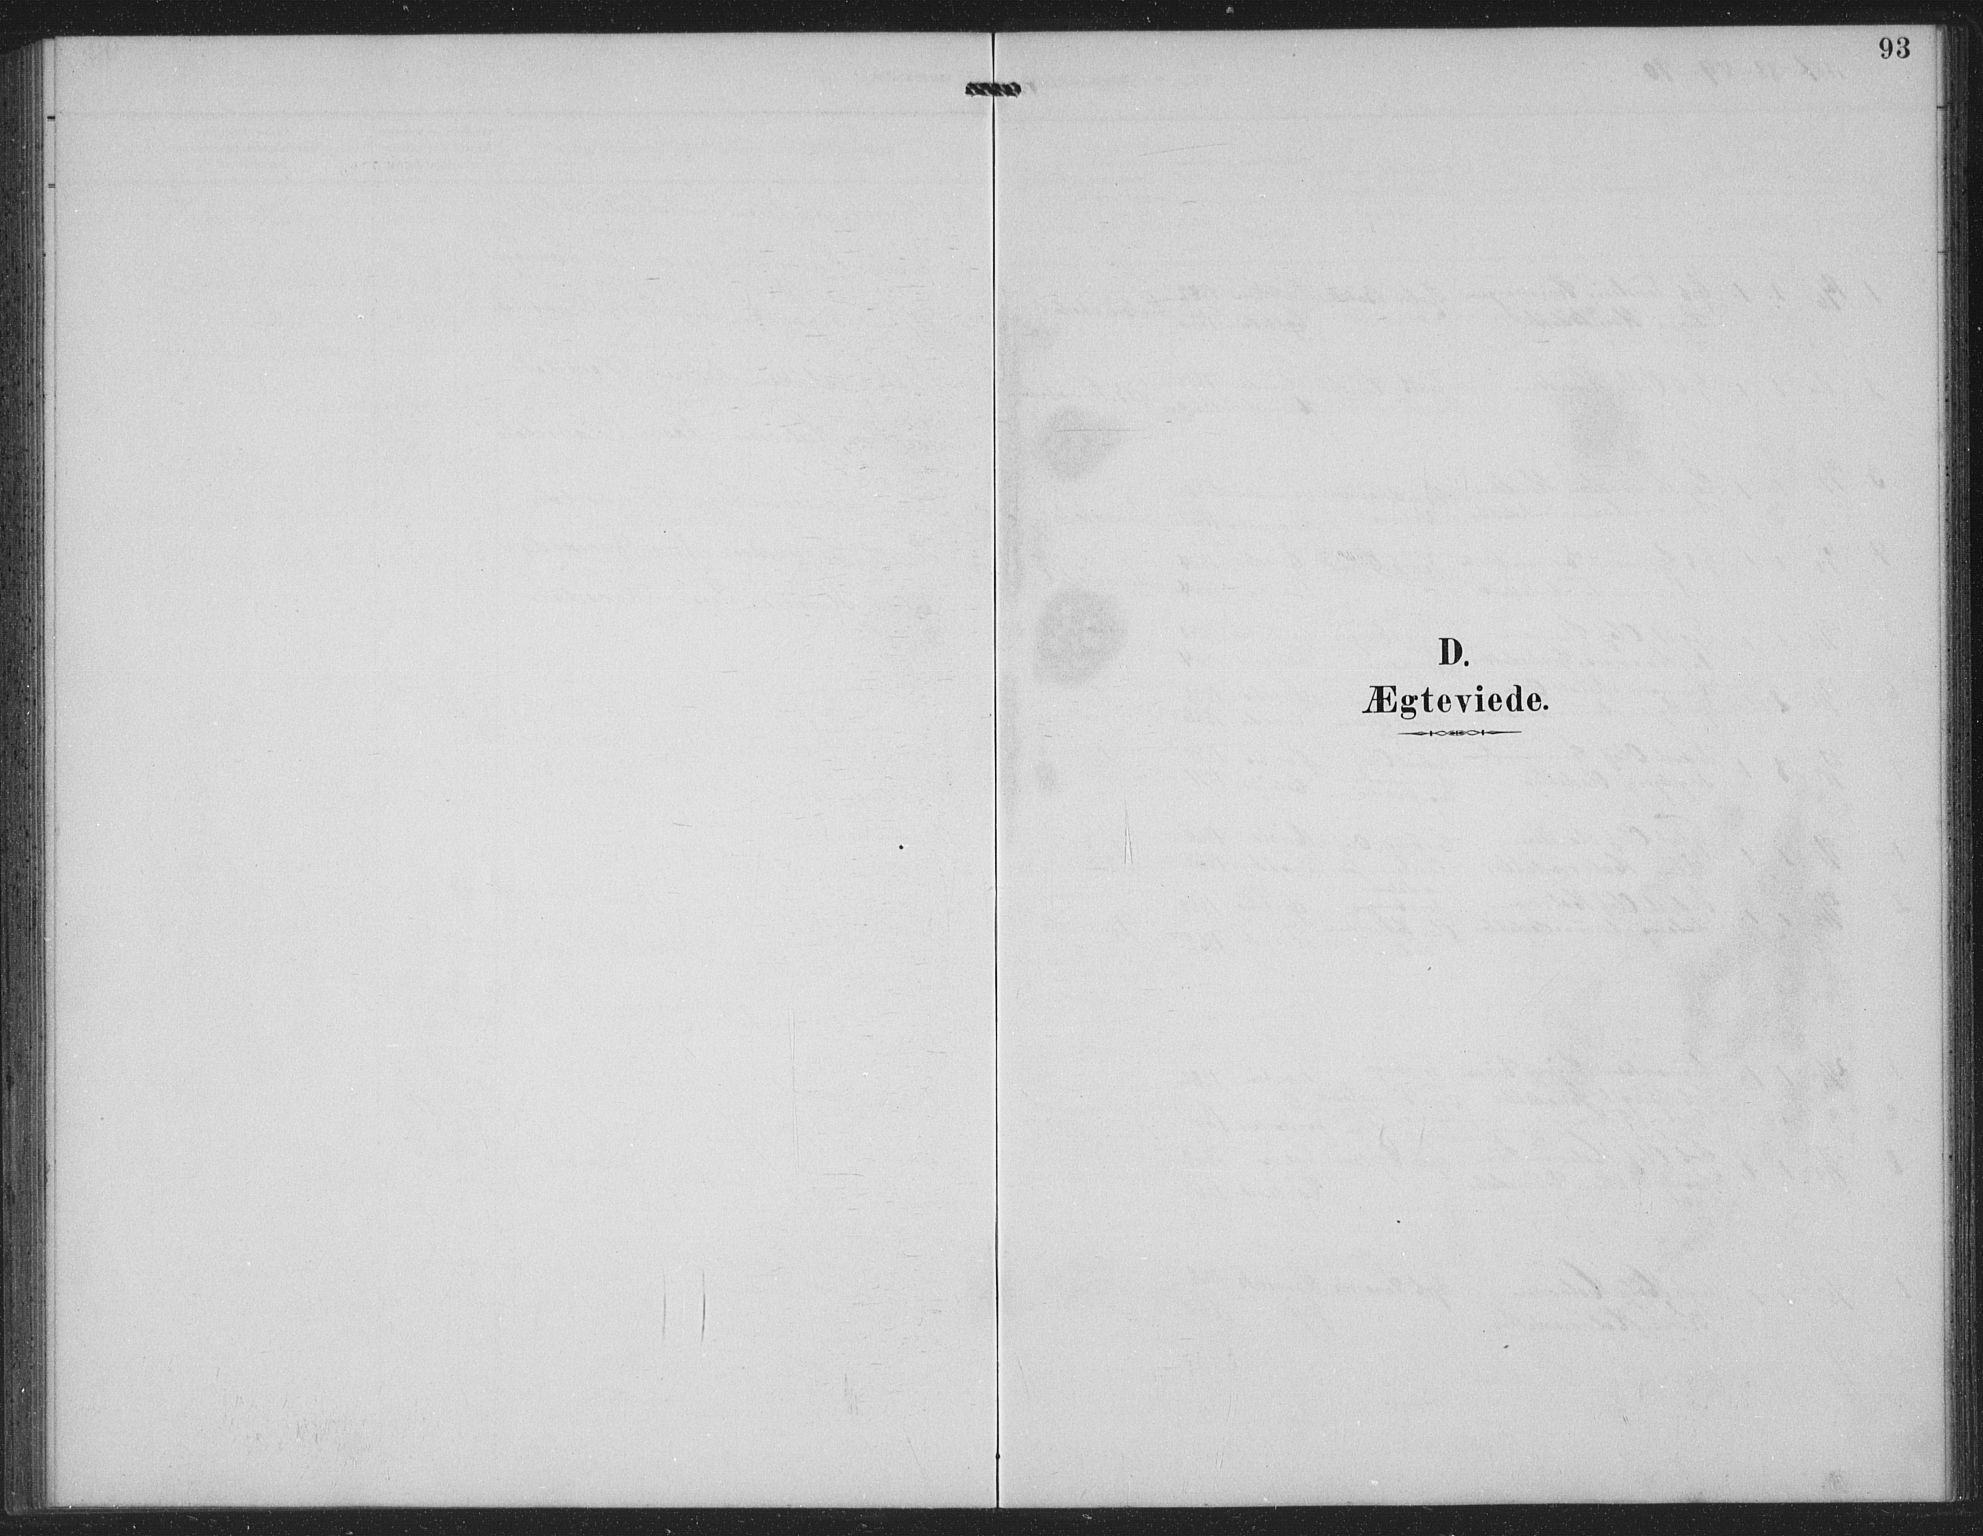 SAKO, Seljord kirkebøker, G/Gc/L0003: Klokkerbok nr. III 3, 1887-1926, s. 93